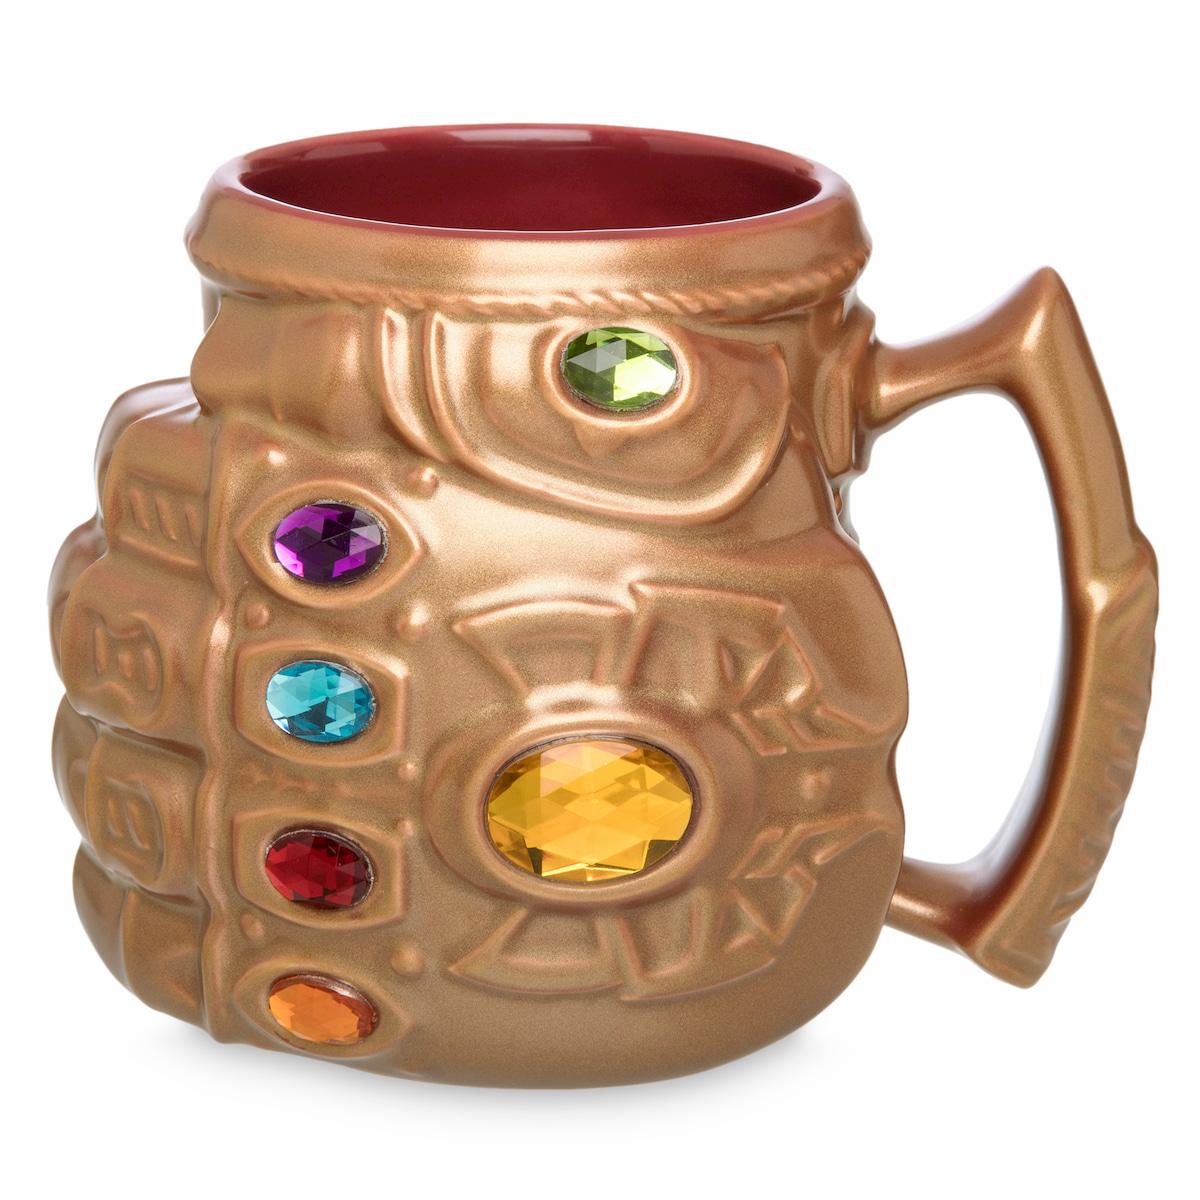 avengers endgame idee regalo tazza thanos guanto infinito